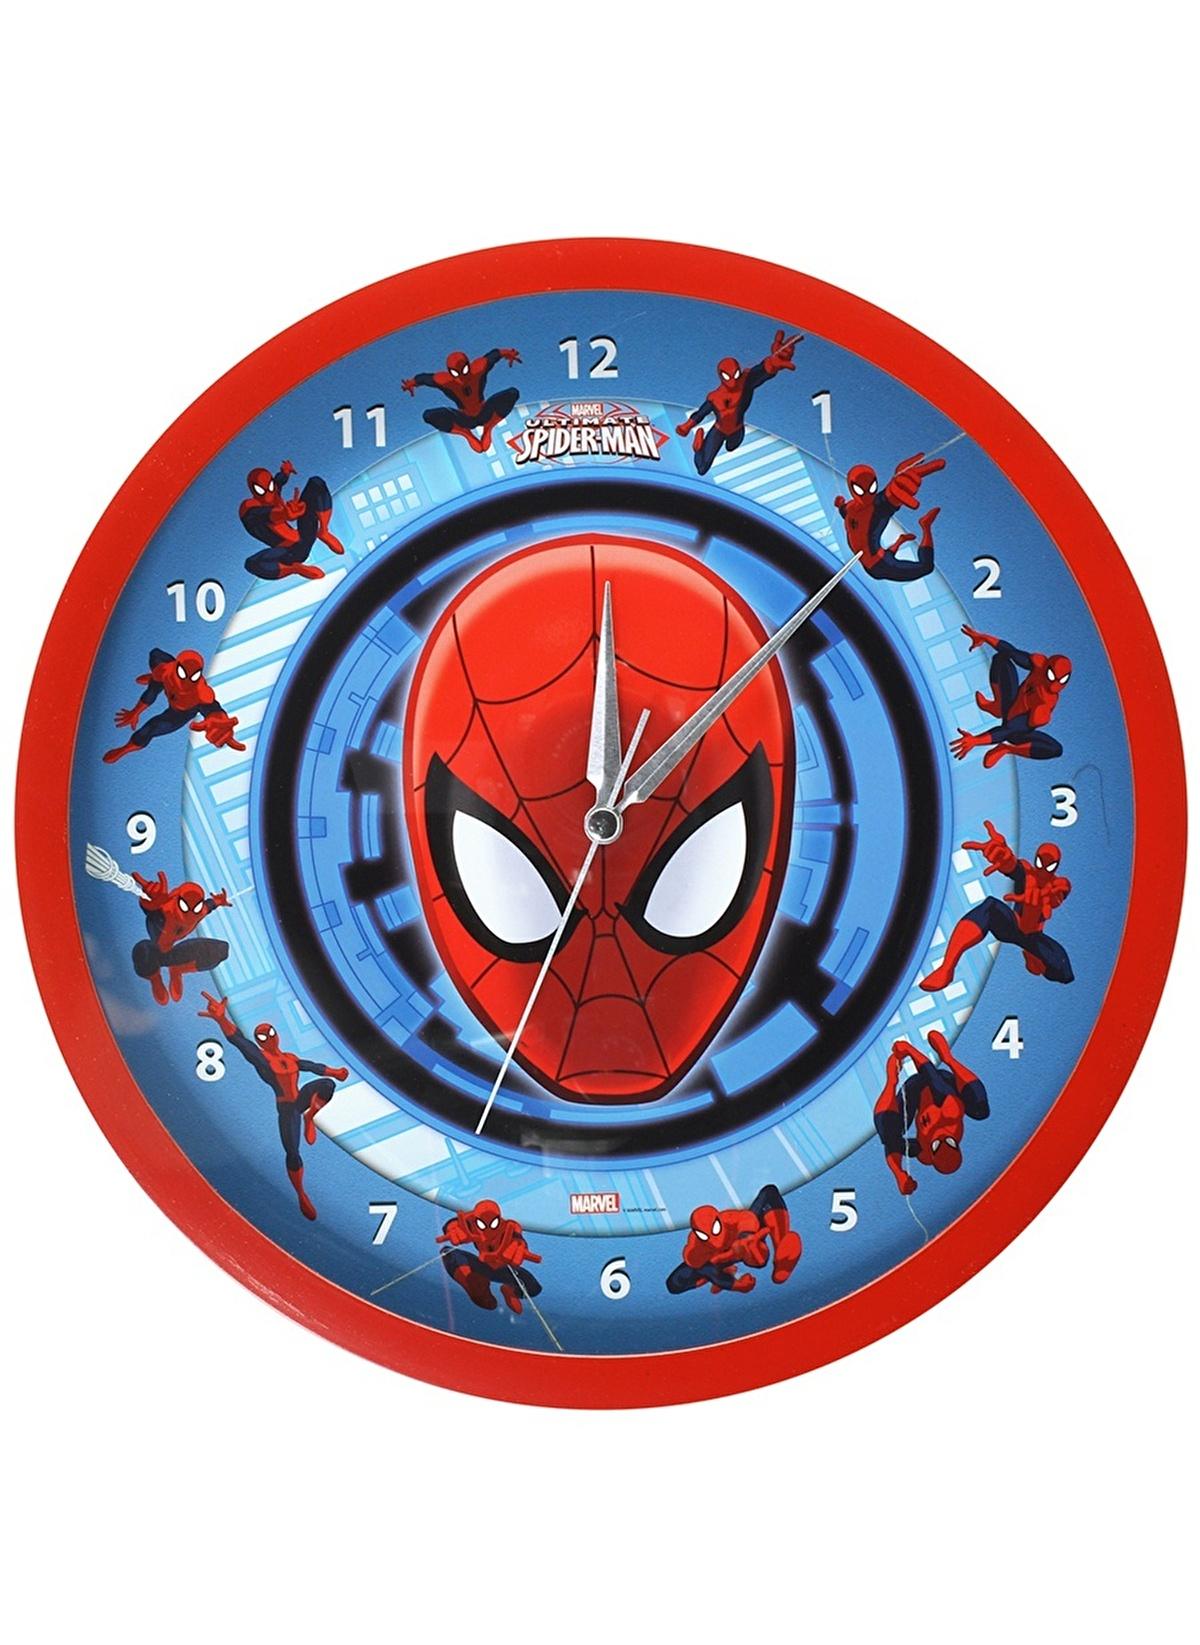 Spider Man Standart örümcek Adam Duvar Saati Renkli Morhipo 14671311